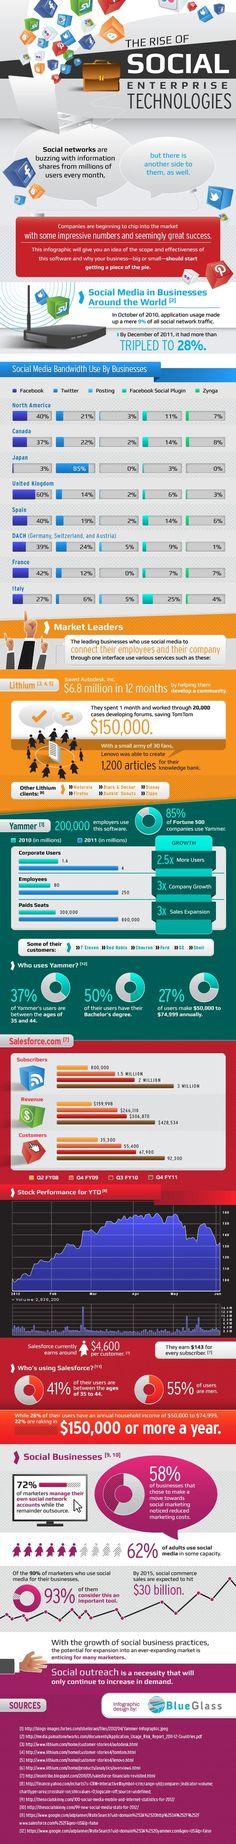 Sosyal Şirket Teknolojilerinin Yükselişi - #sosyalmedya #sosyalmedyapazarlama #socialmedia #socialmediamarketing #infografik #infographic #twitter #facebook #youtube #linkedin #blogger  #friendfeed #google   #foursquare #pinterest